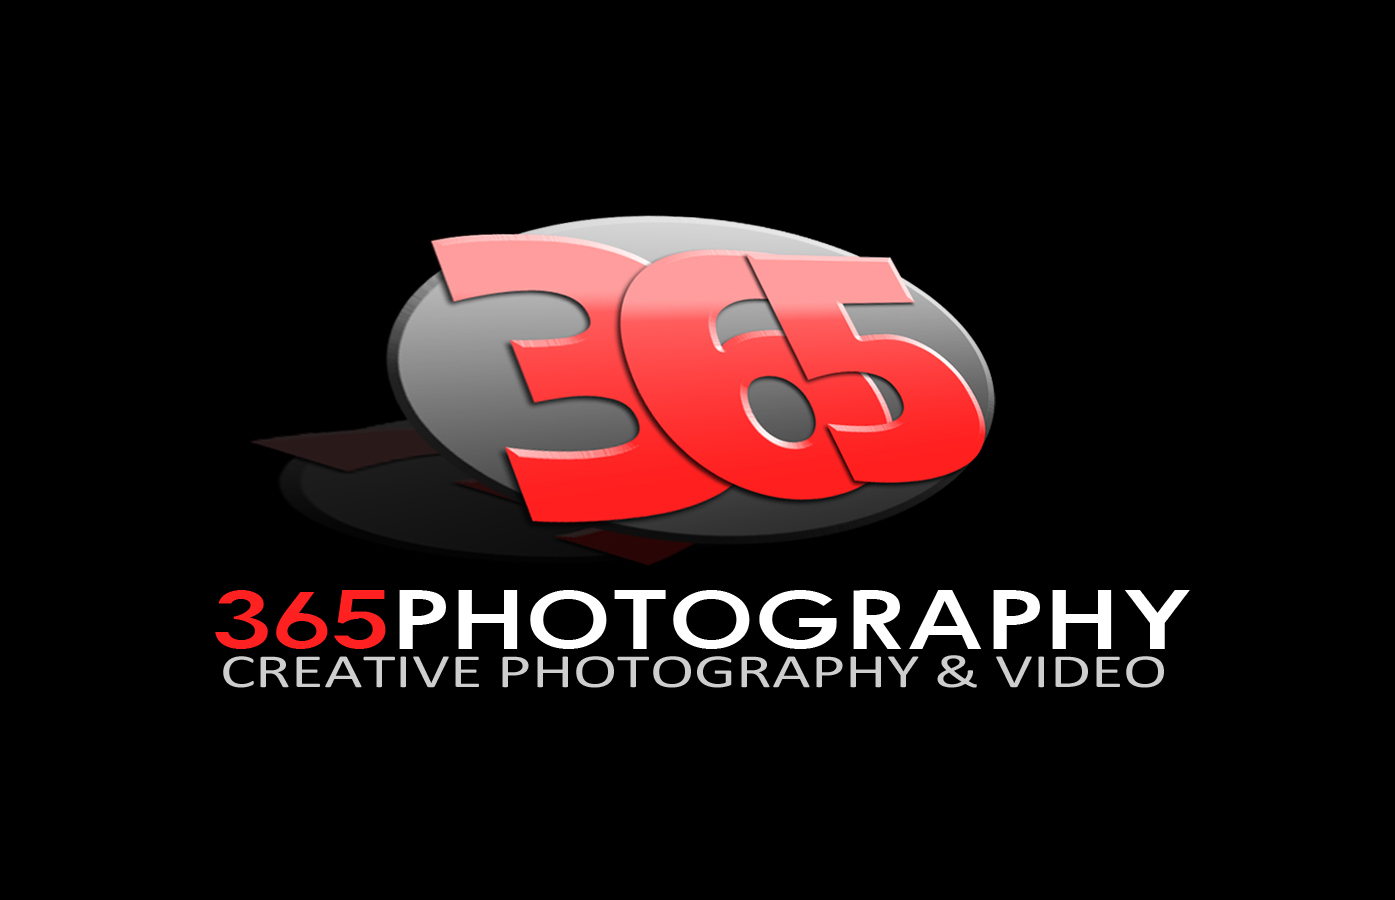 Logo Design by Mik El - Entry No. 36 in the Logo Design Contest 365photography Creative Photography & Video Logo Design.